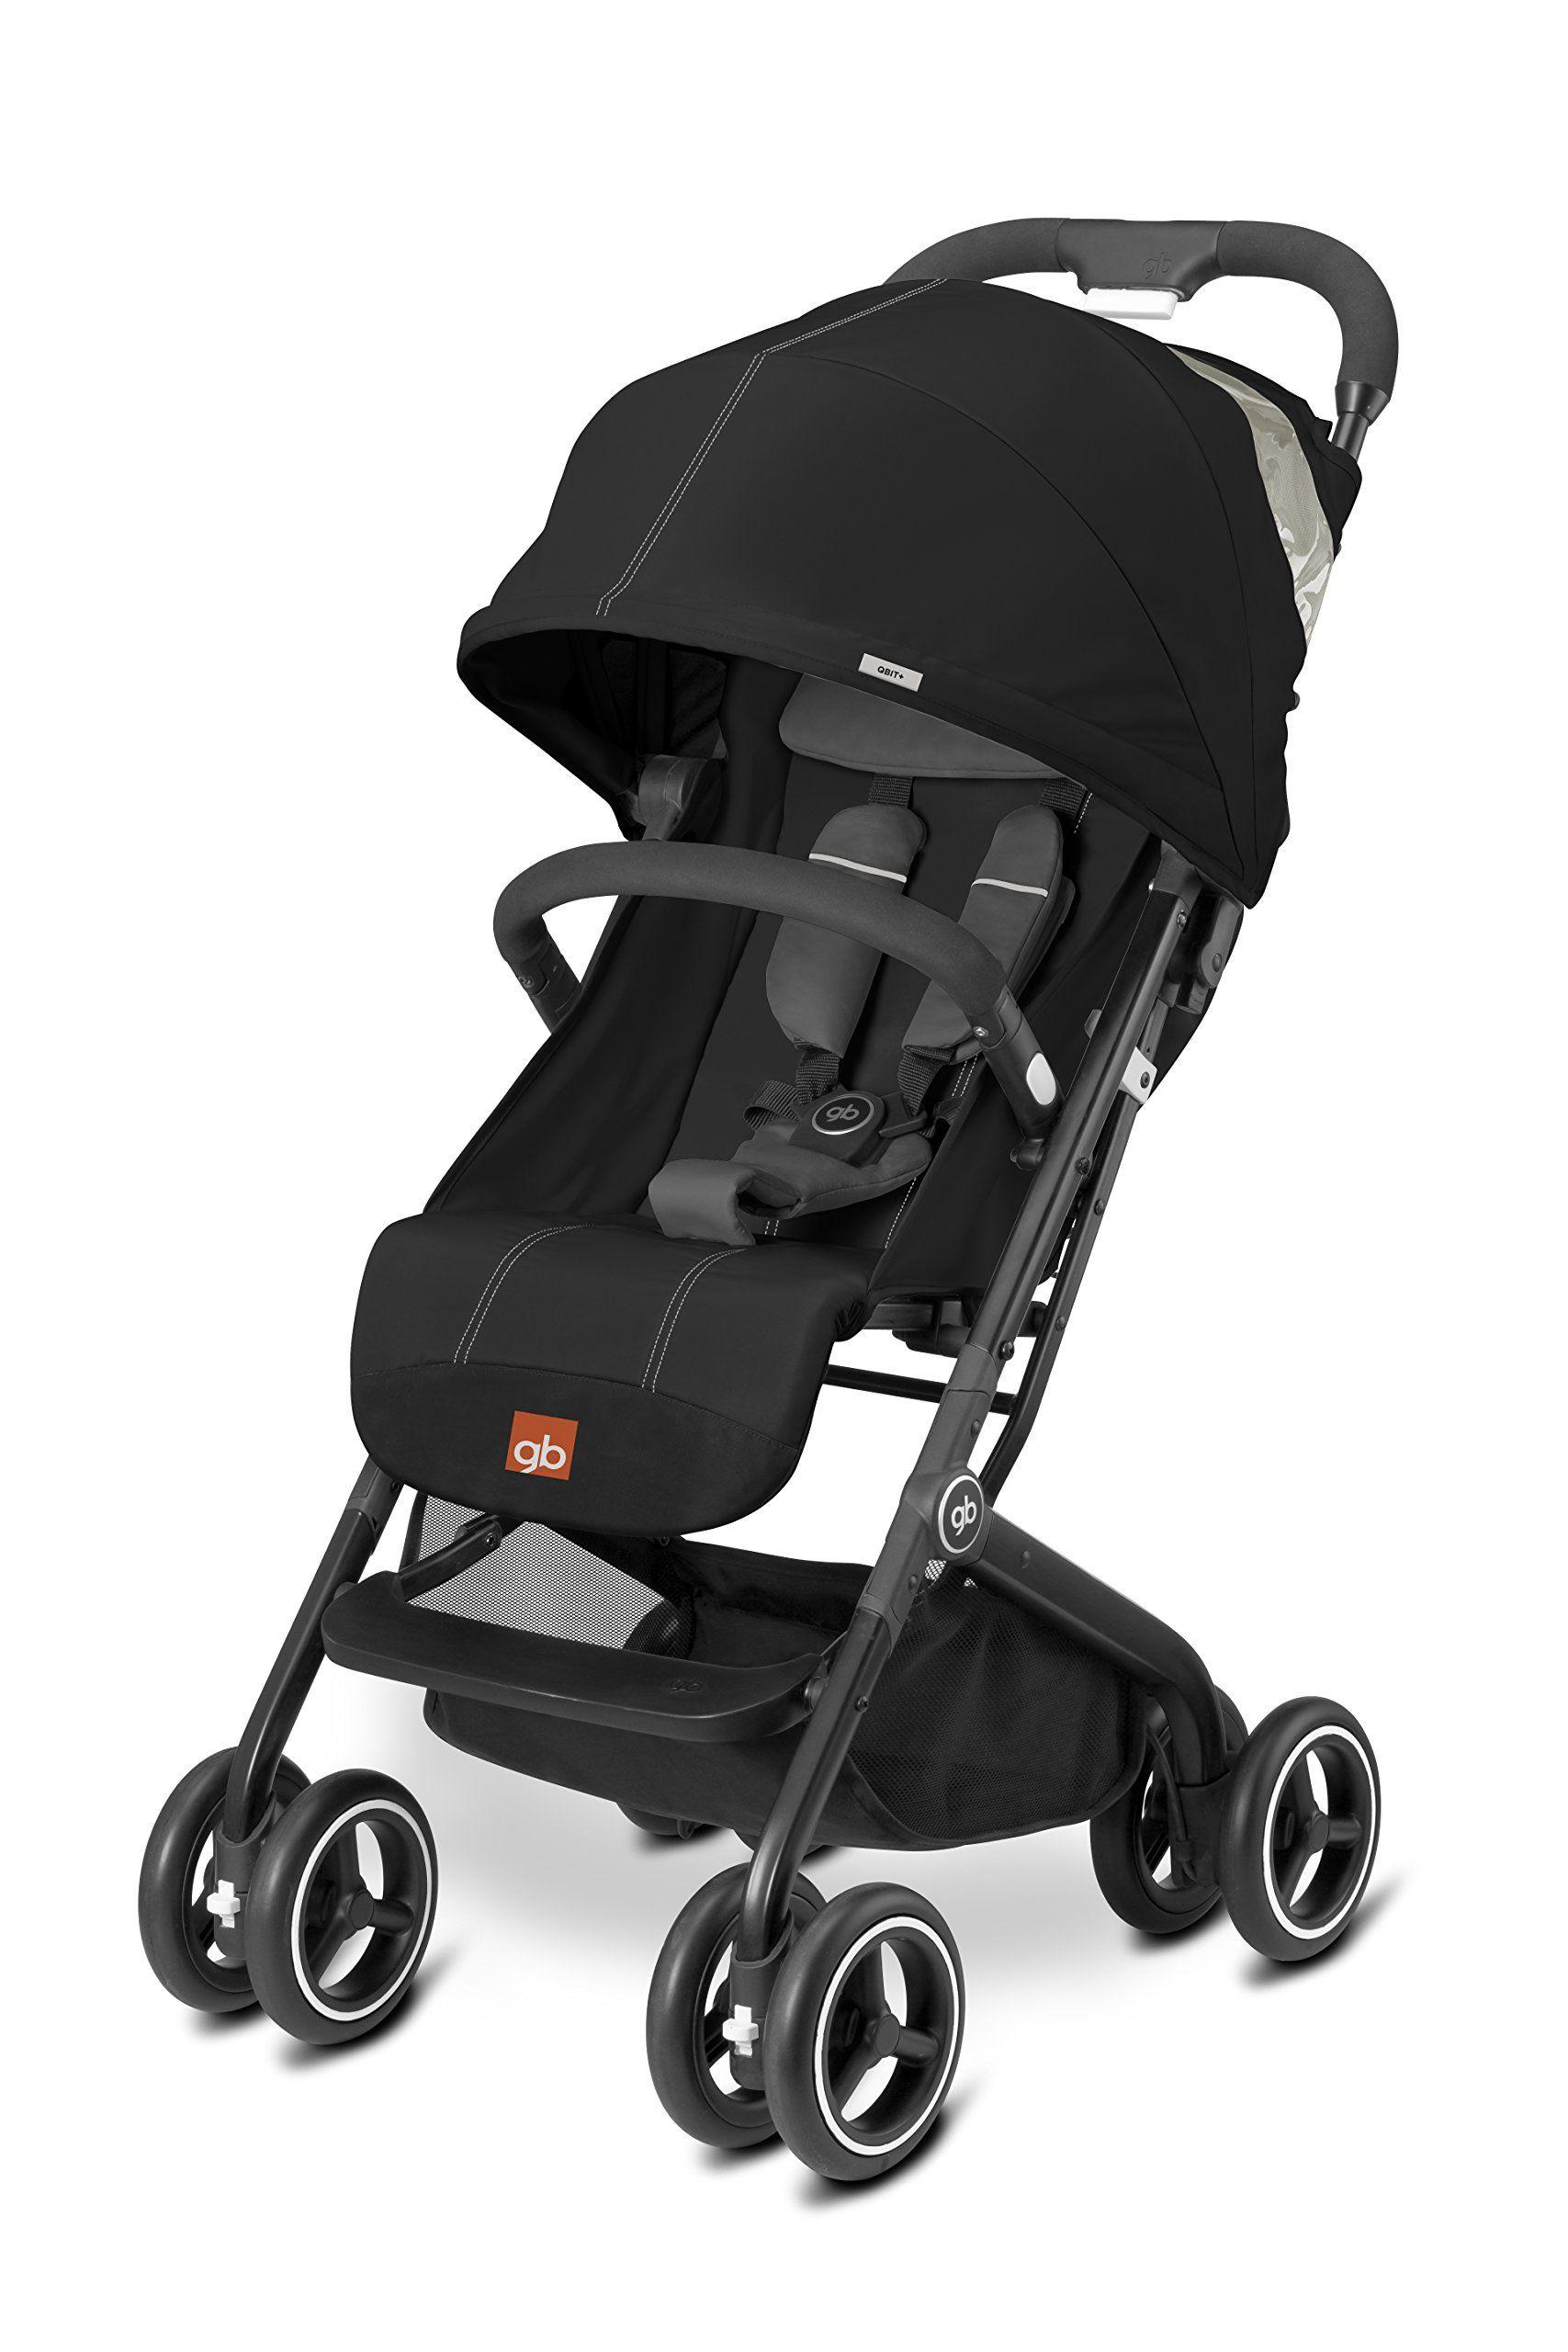 Shop (With images) Stroller, Travel stroller, Baby strollers